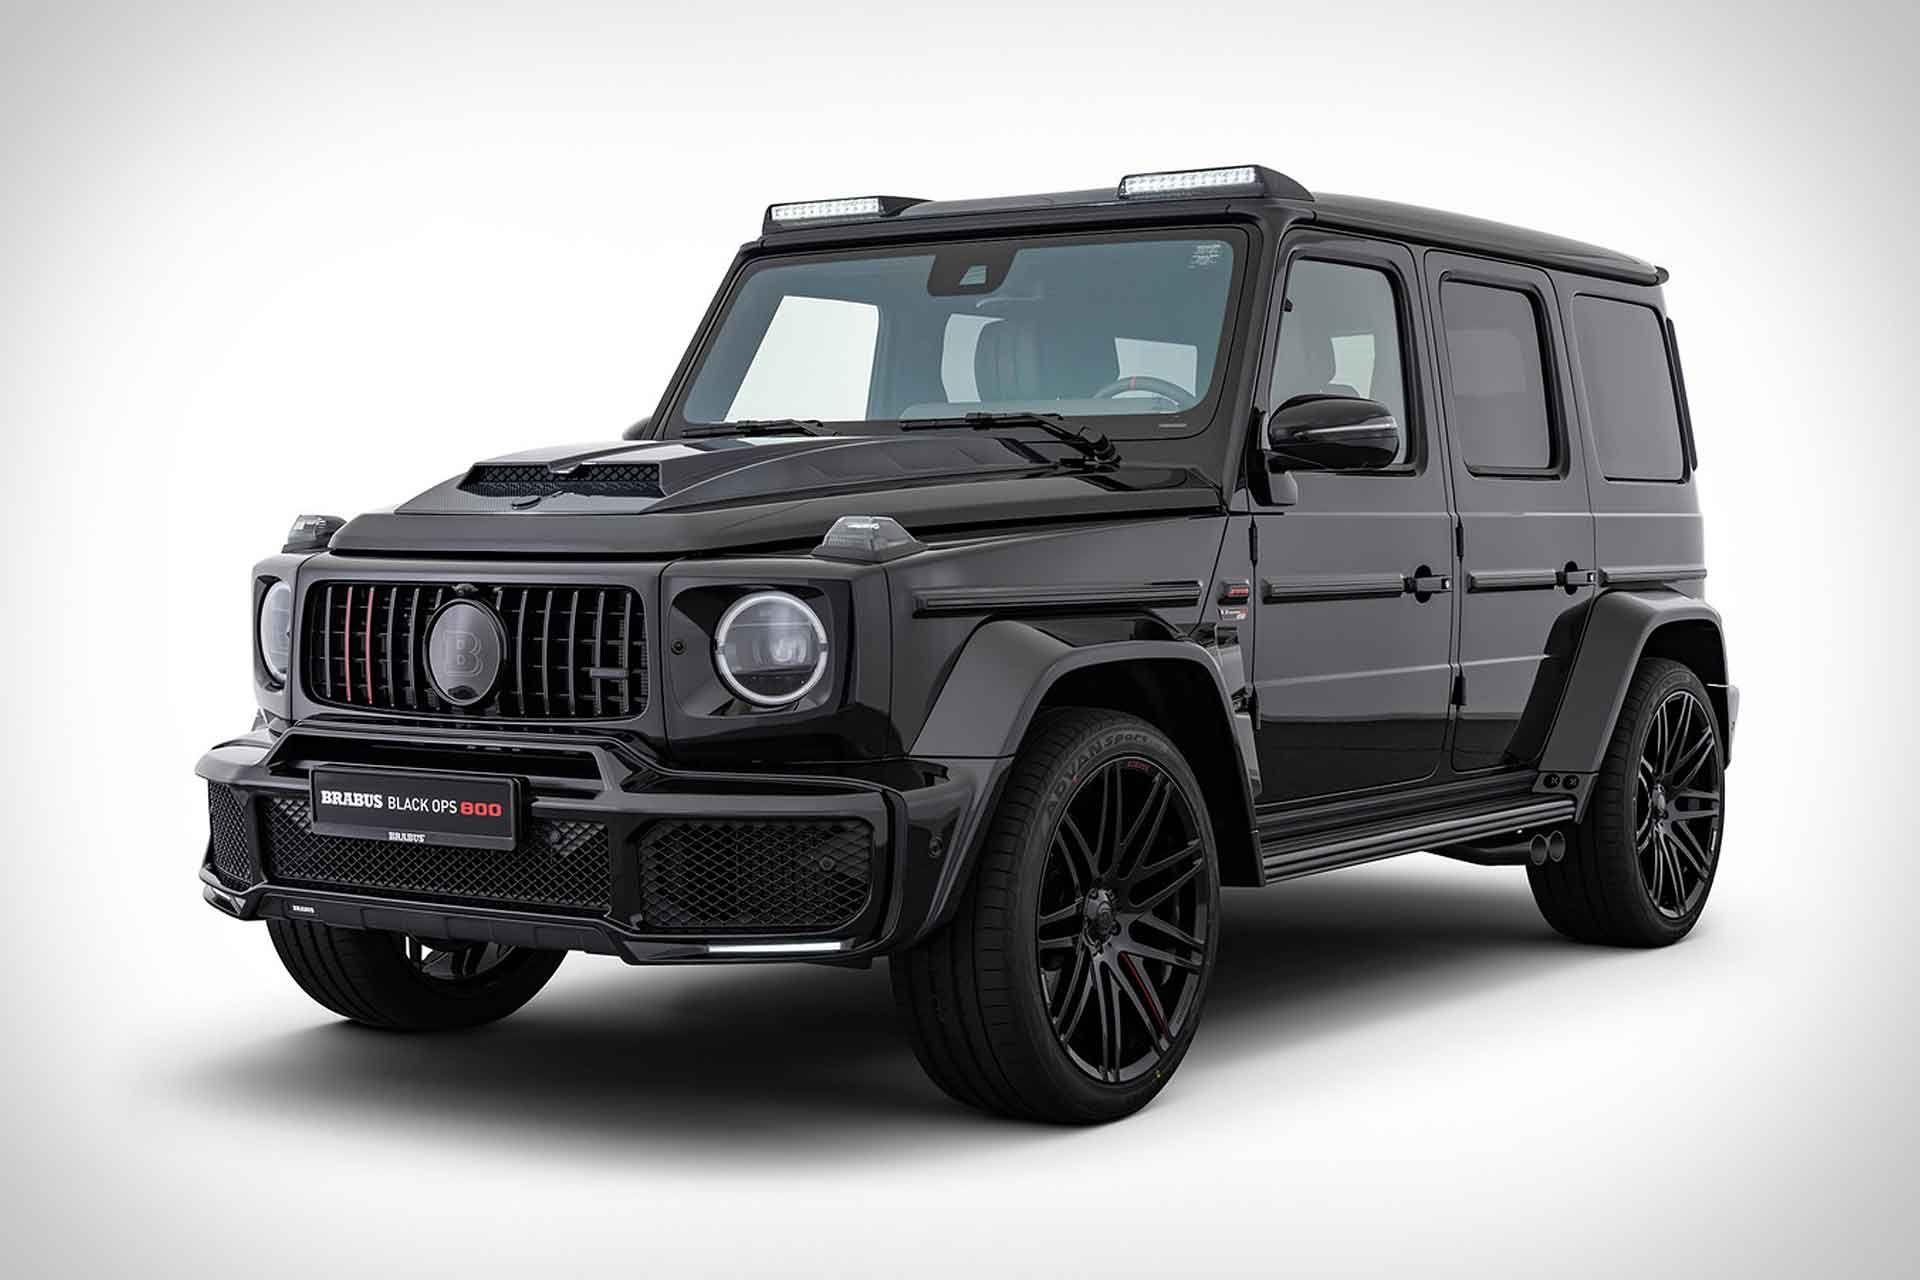 Brabus Black Ops 800 Suv Mercedes Amg Vehiculo De Lujo Clase G